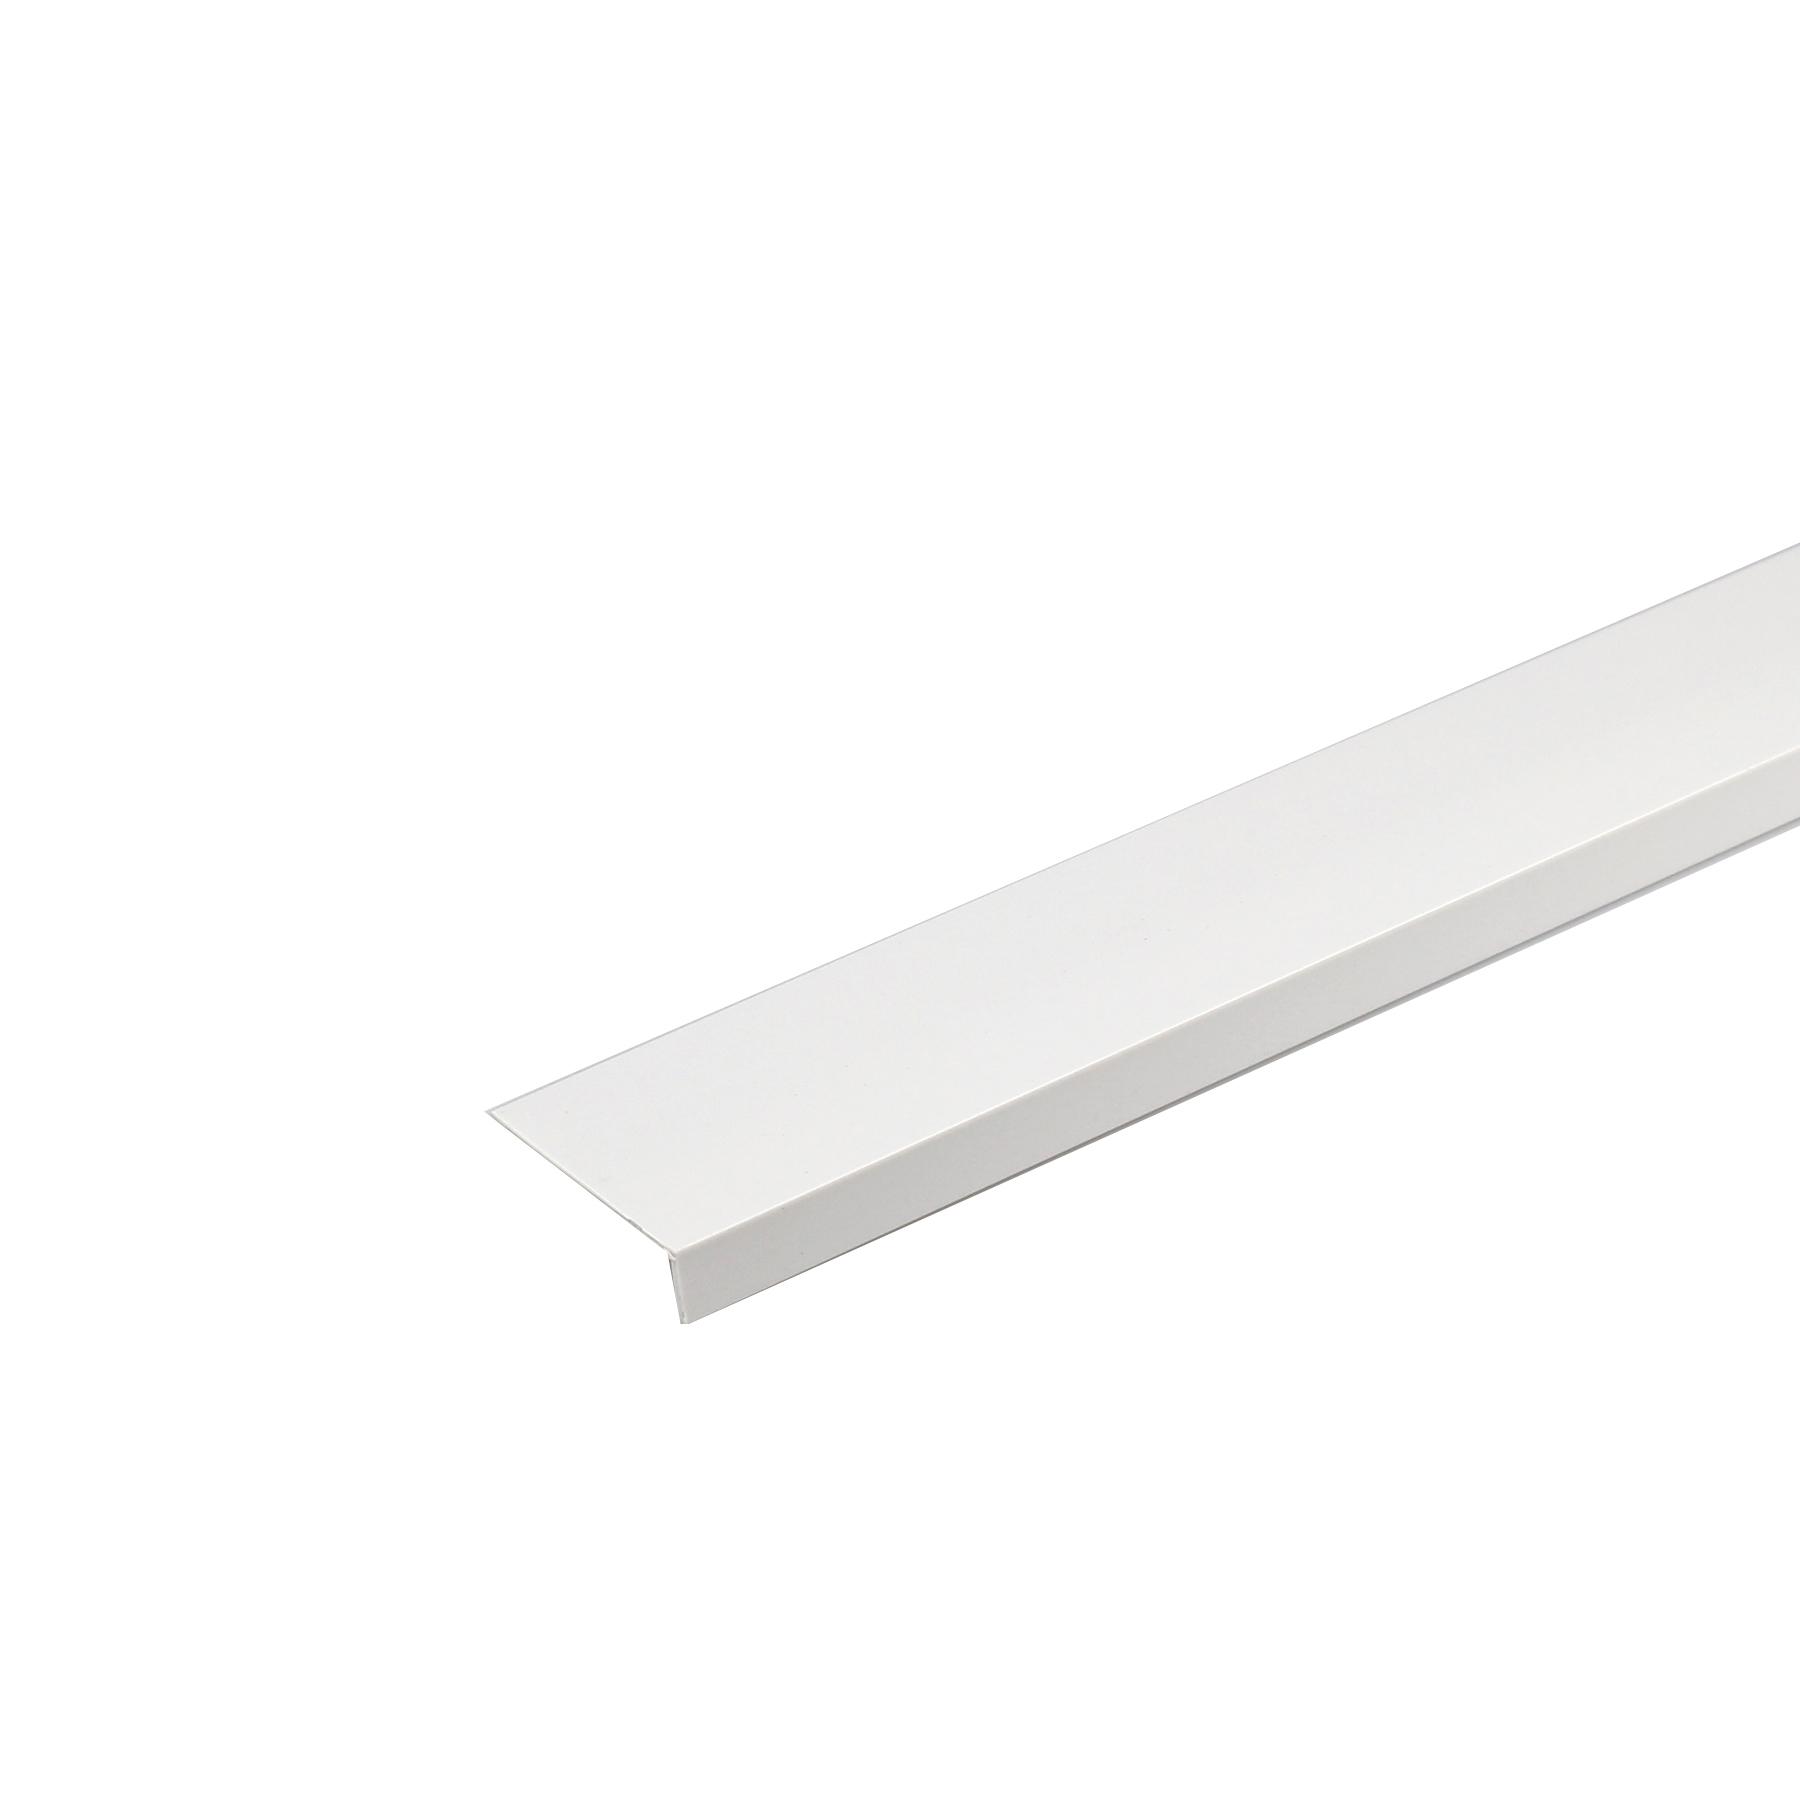 Perfil Angular Diferente PVC Porcelana 1mx2cm